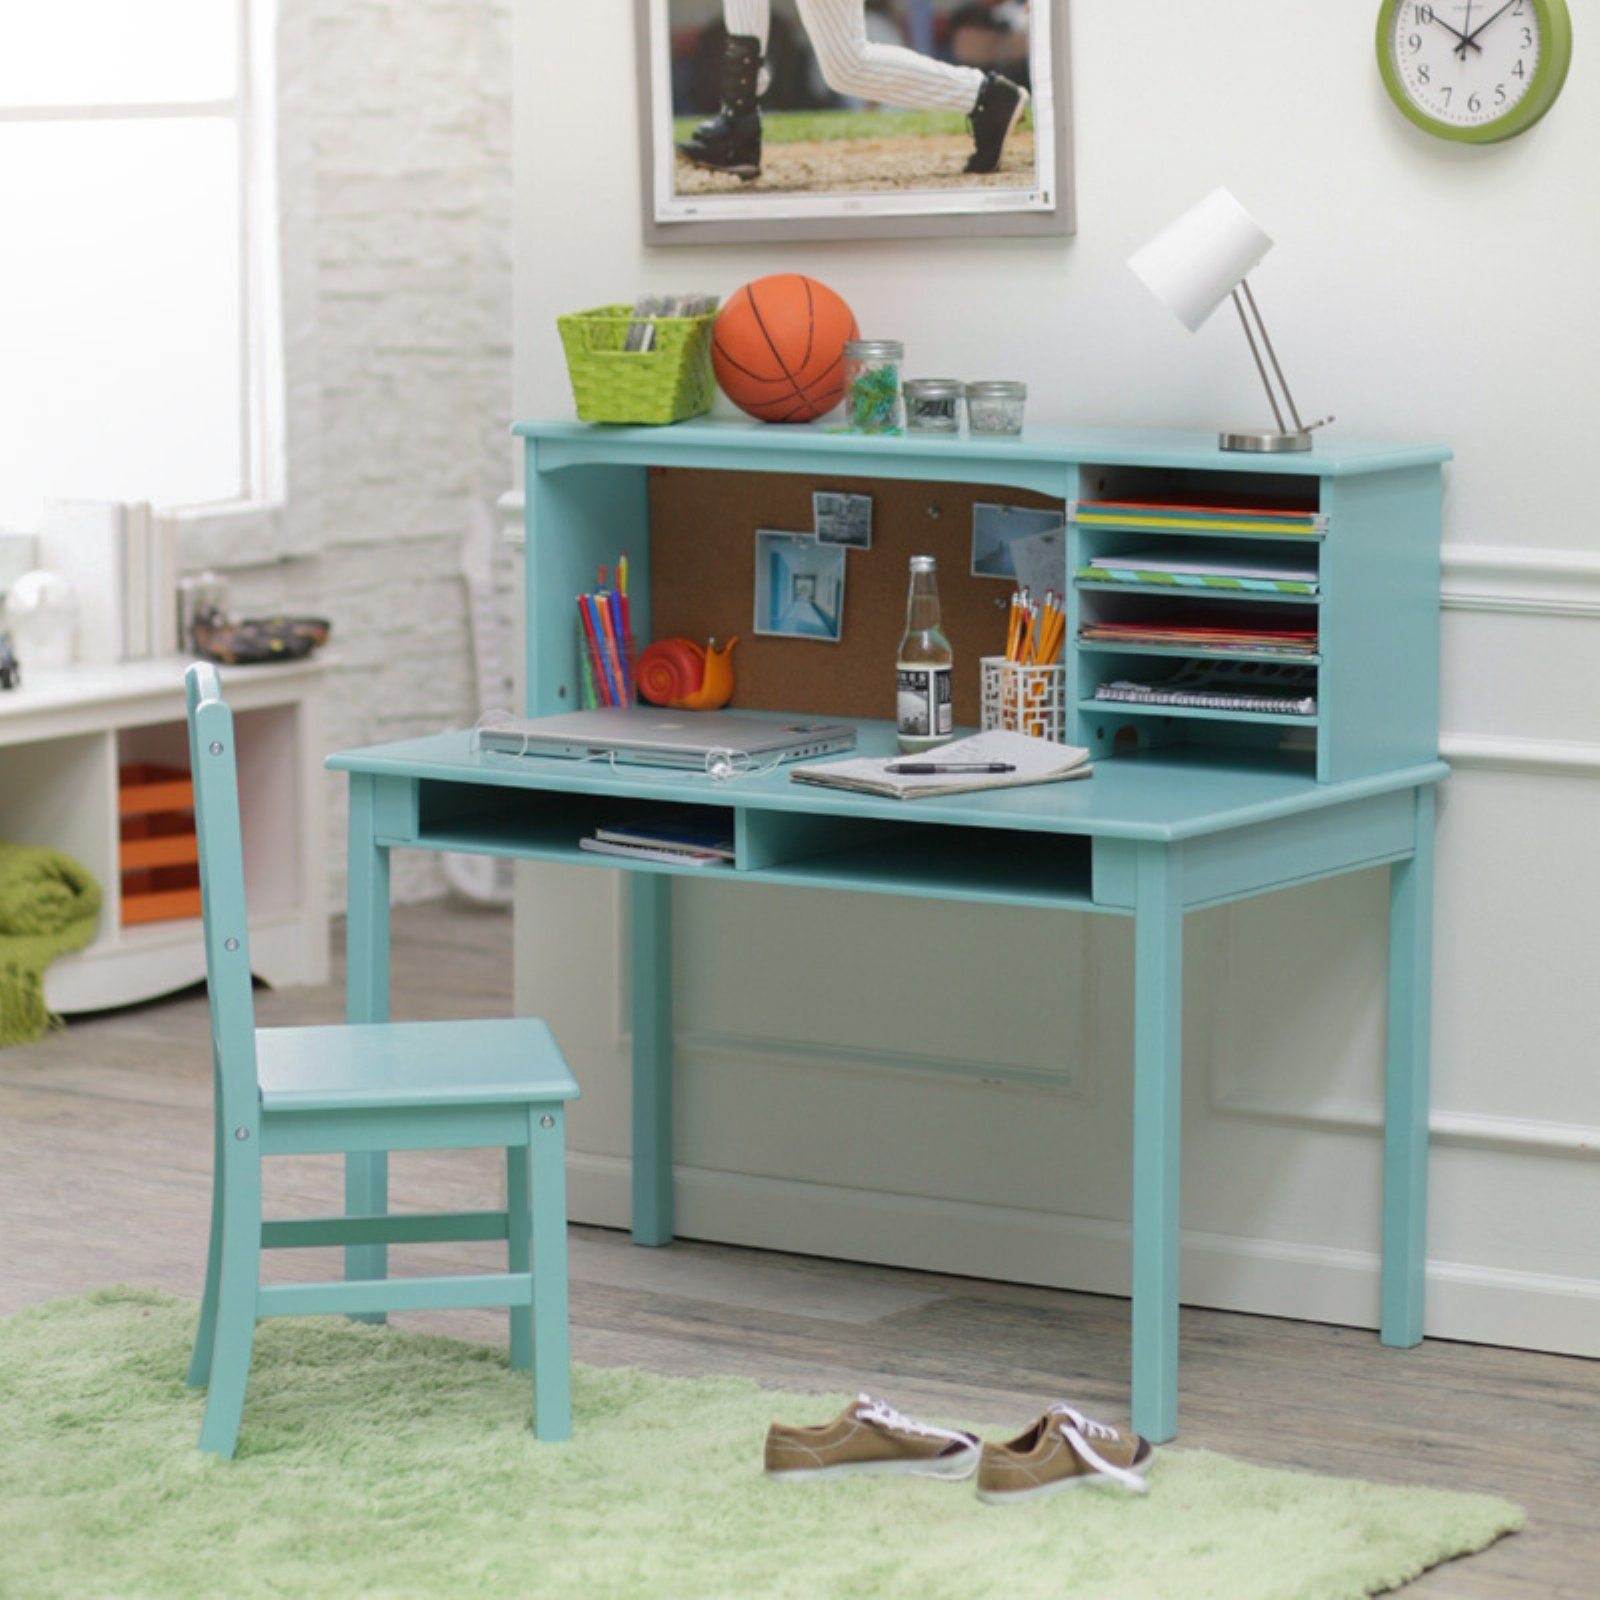 Guidecraft Media Desk Chair Set Teal Walmart Com Kids Desk Chair Desk And Chair Set Girls Desk Chair